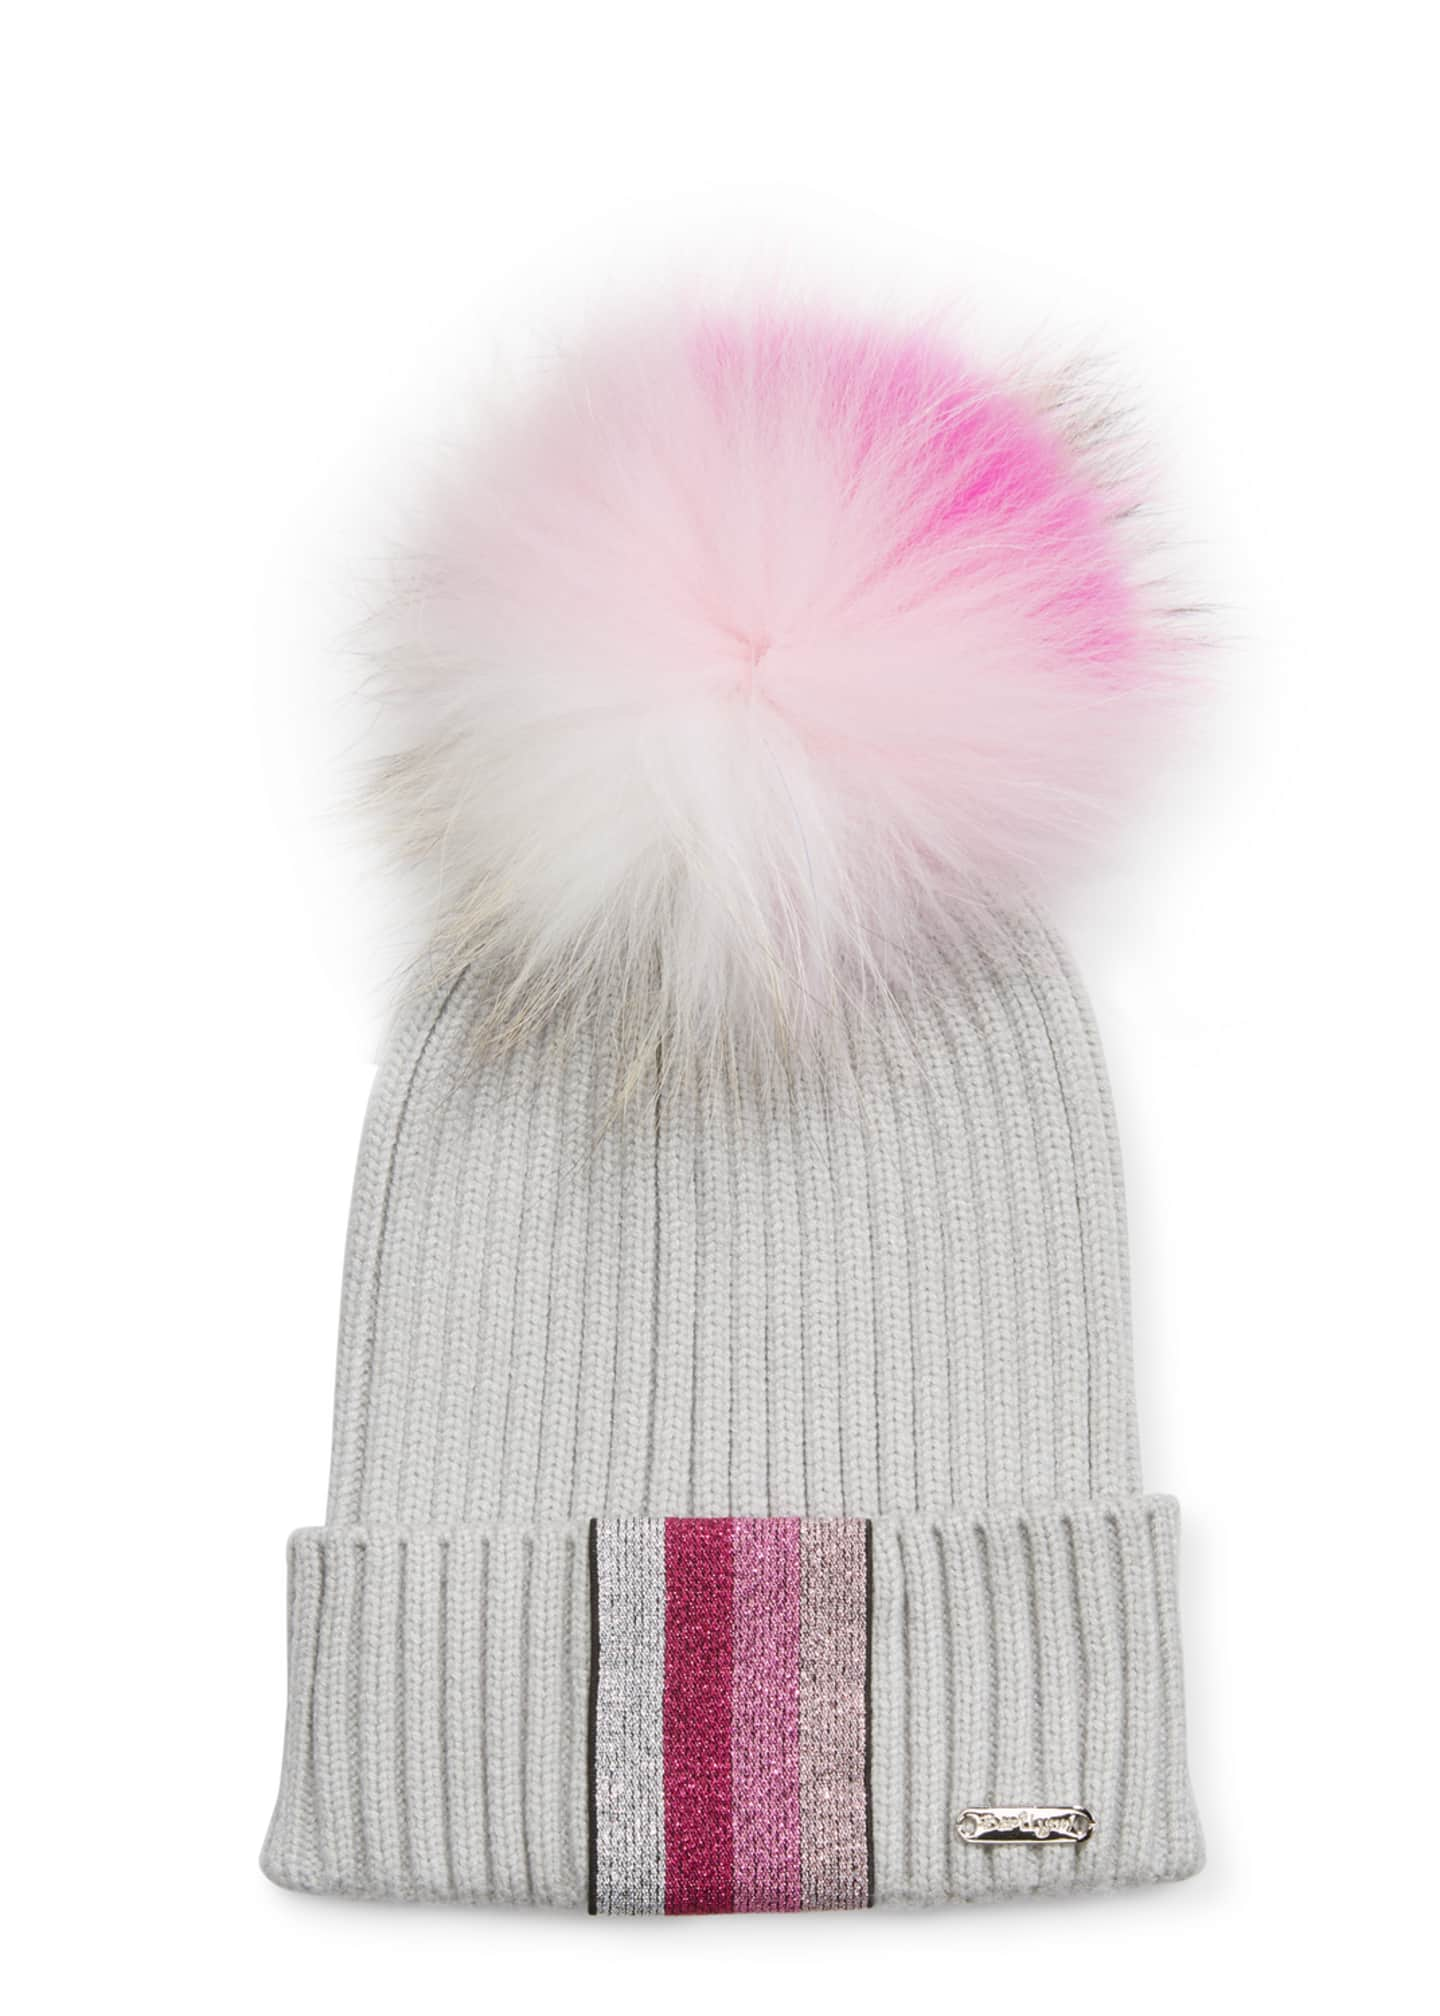 Bari Lynn Ribbed Lurex Taping Beanie Hat w/